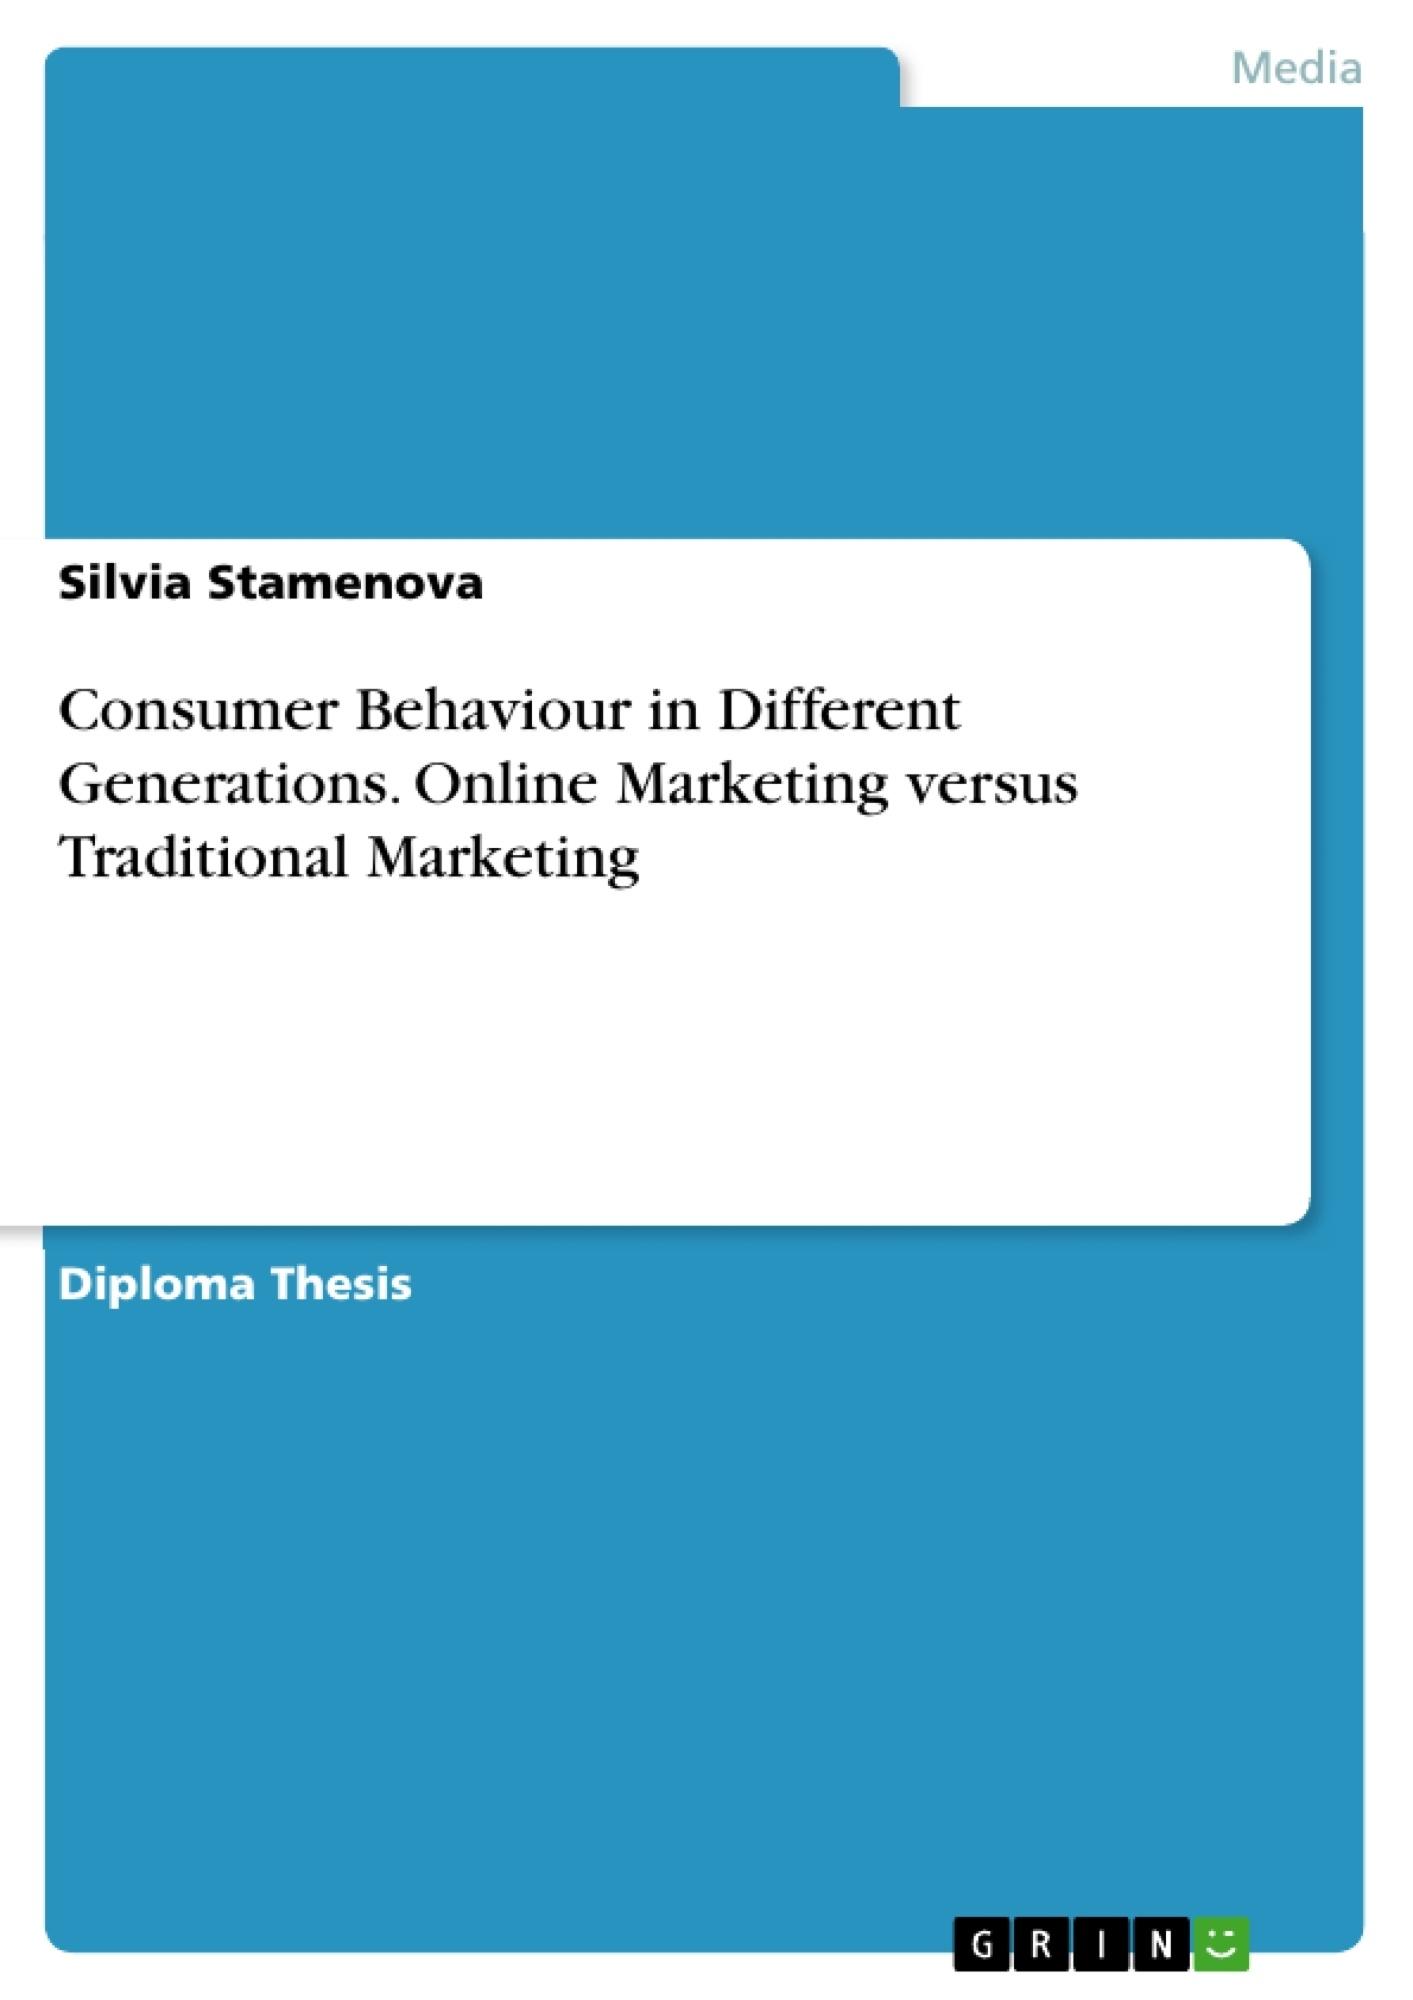 Title: Consumer Behaviour in Different Generations. Online Marketing versus Traditional Marketing